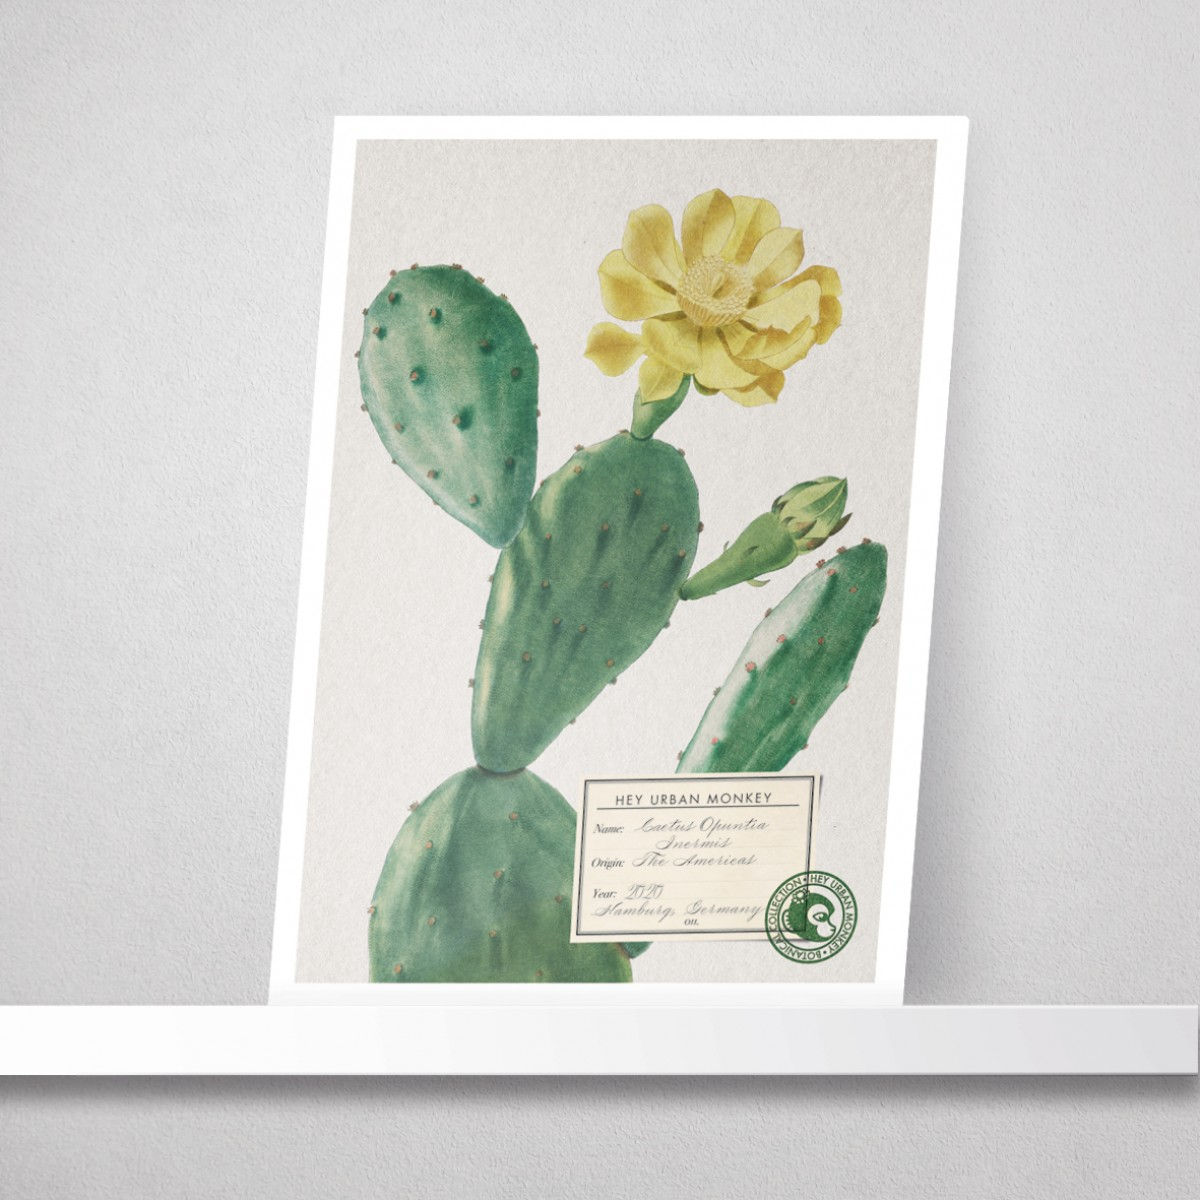 "Hey Urban Monkey - A4 Poster - ""Cactus Opuntia Inermis"""